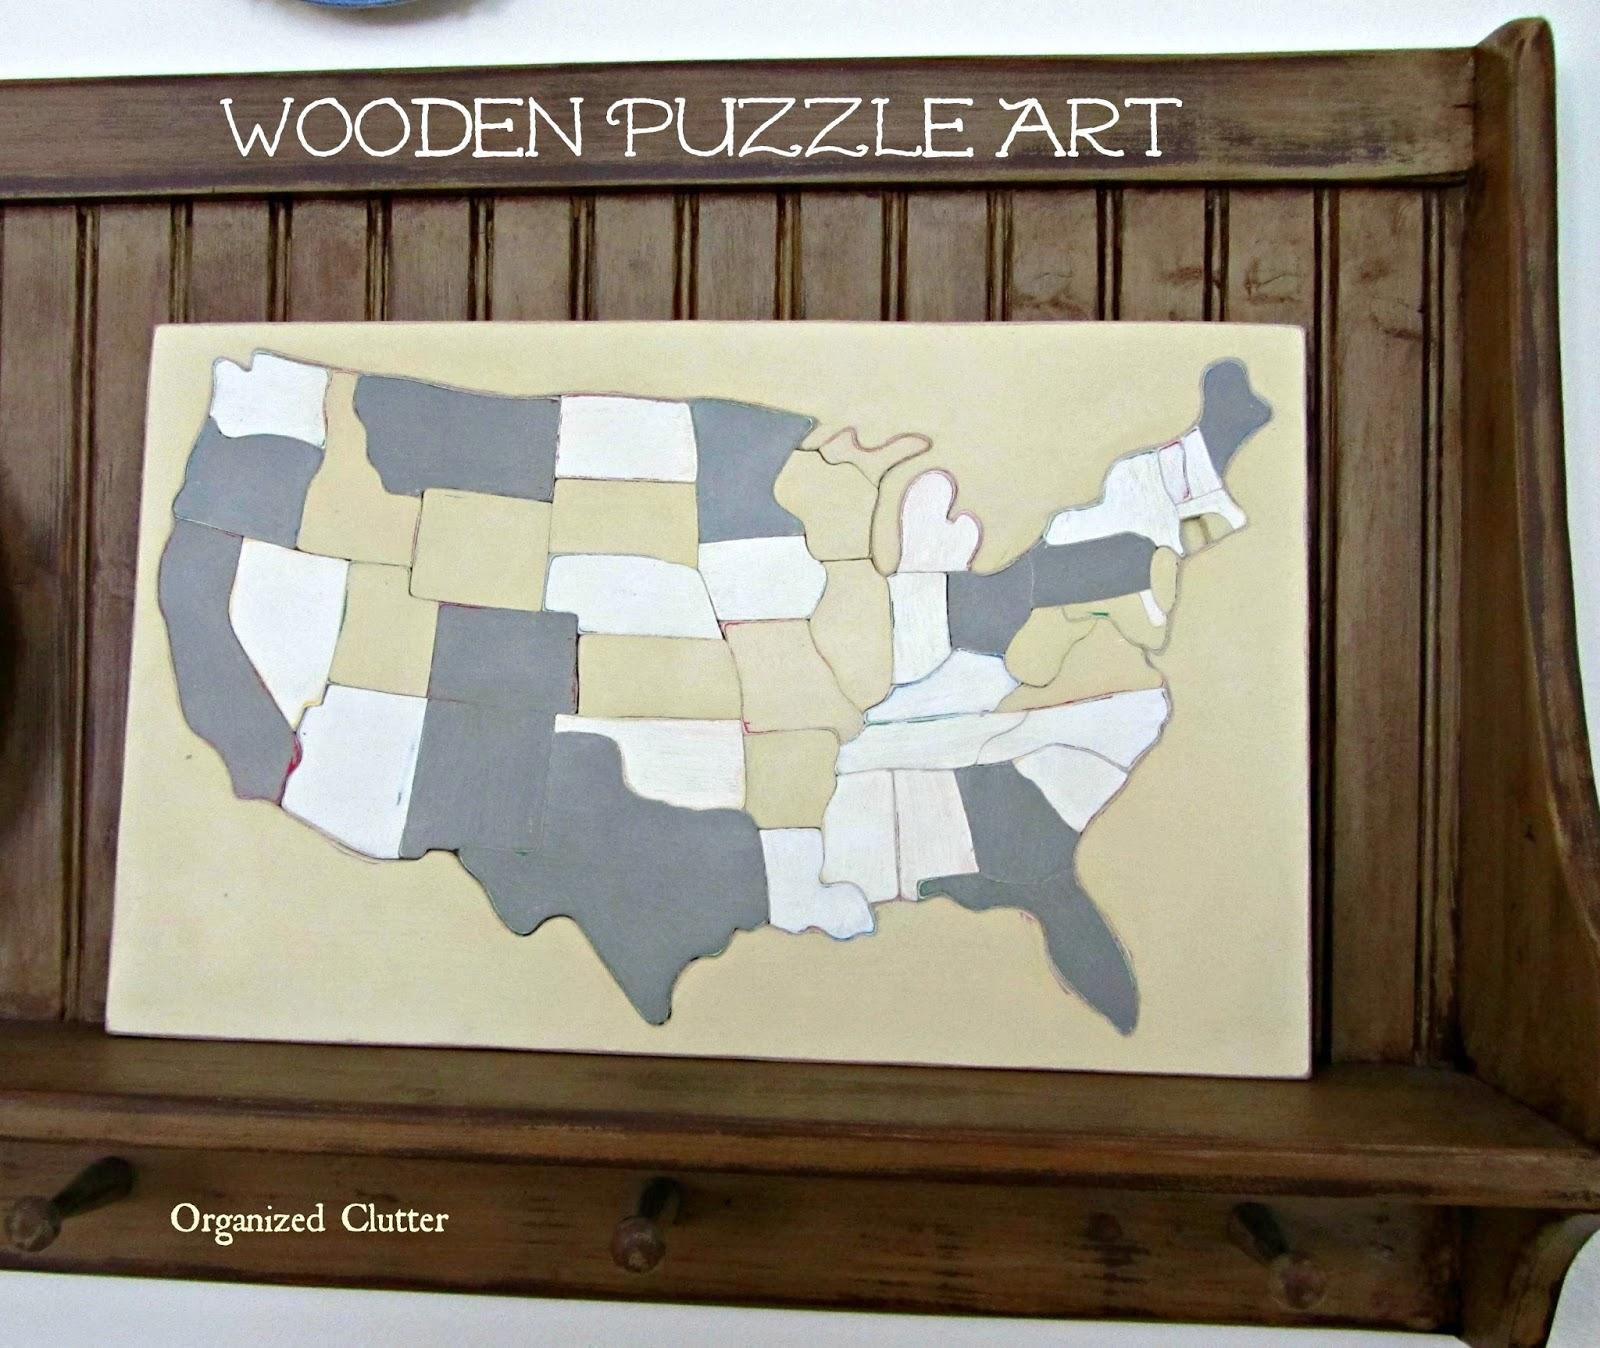 Organized Clutter Vintage Wood Puzzle Art